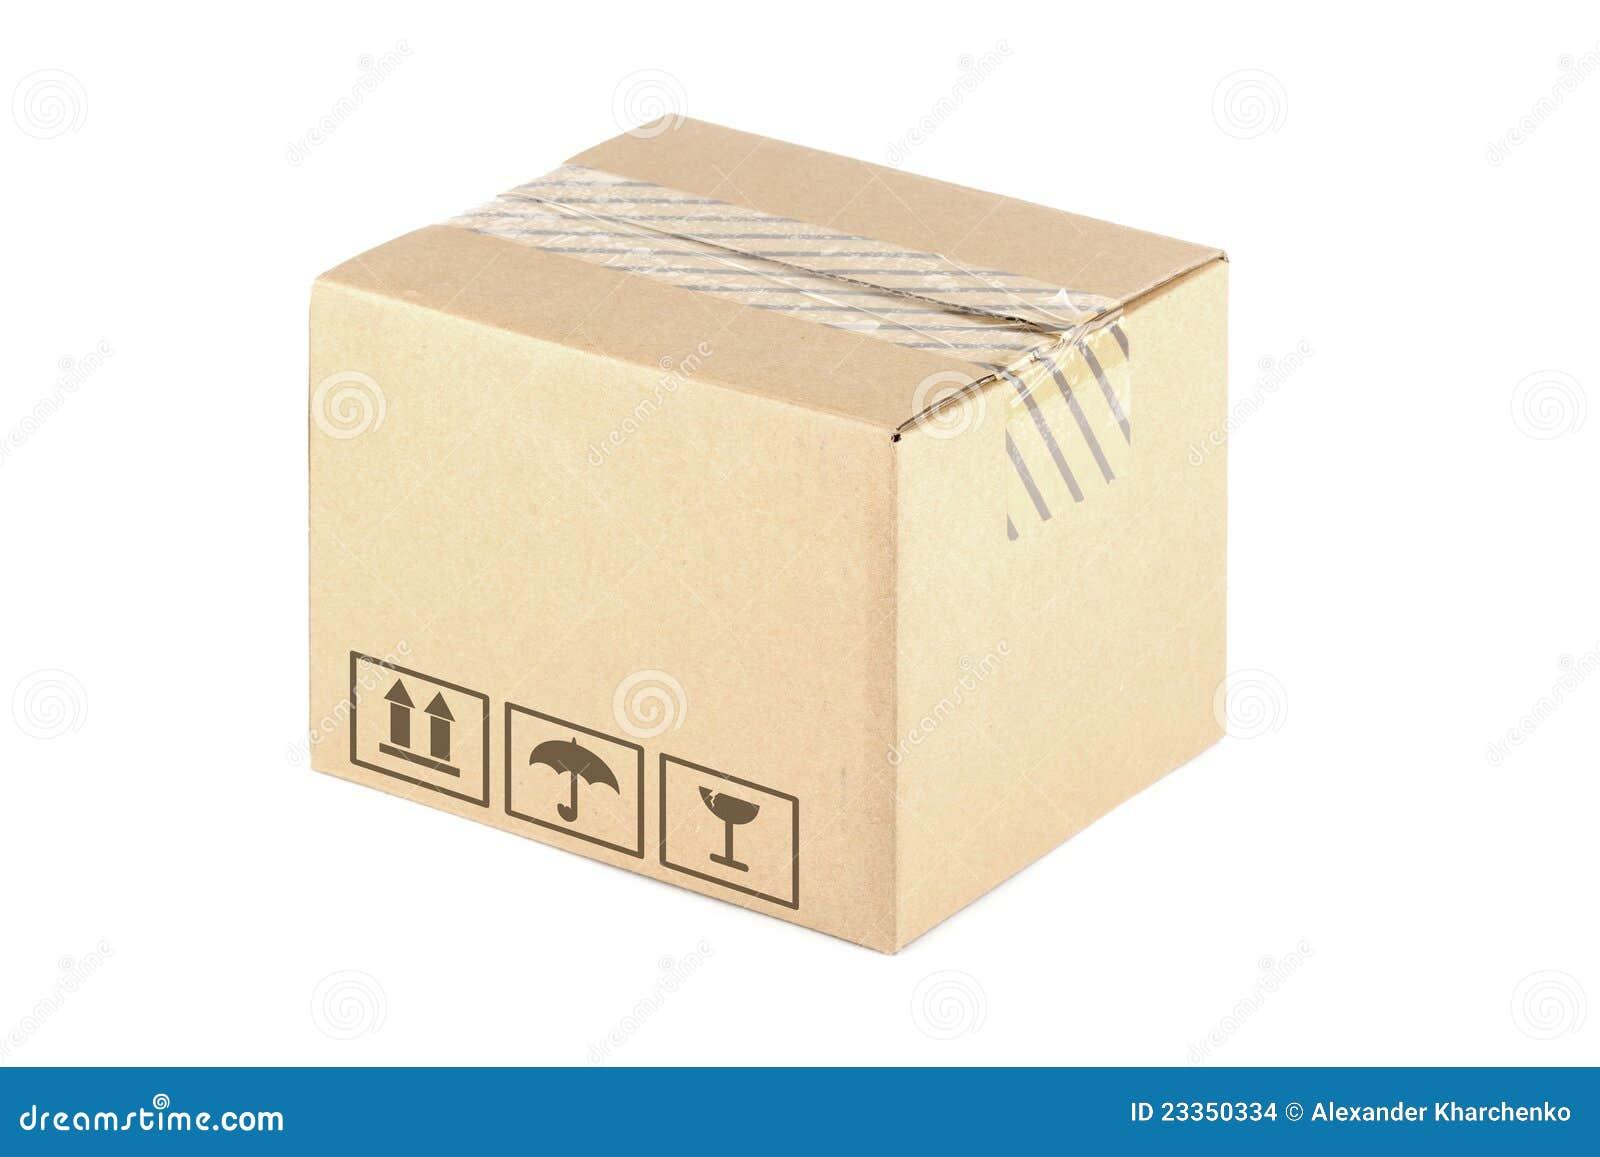 Cardboard box symbols stock photos 193 images carton box with symbols on the white background stock images biocorpaavc Choice Image